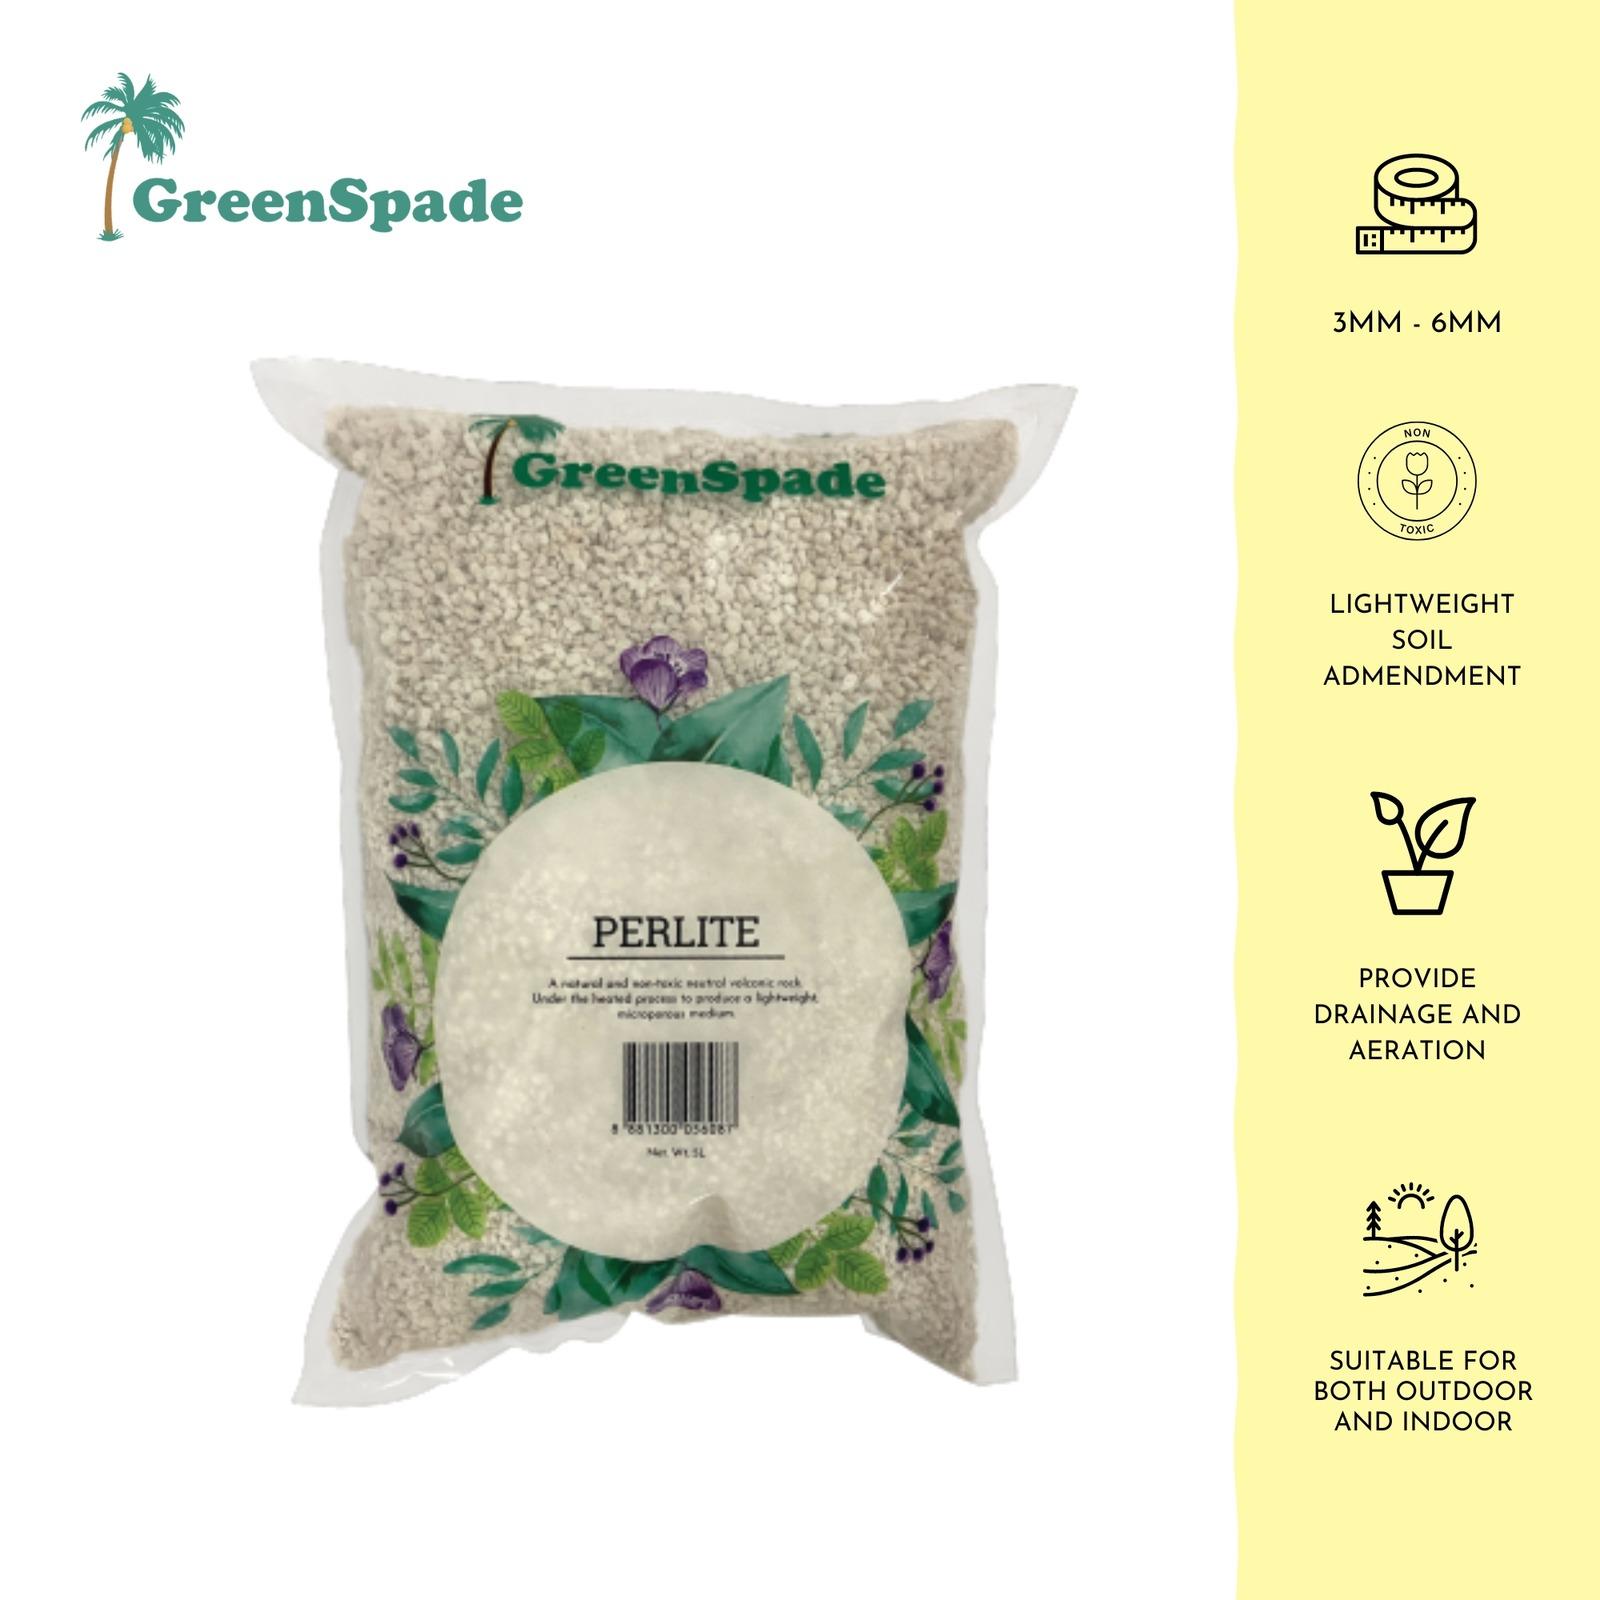 GreenSpade Perlite